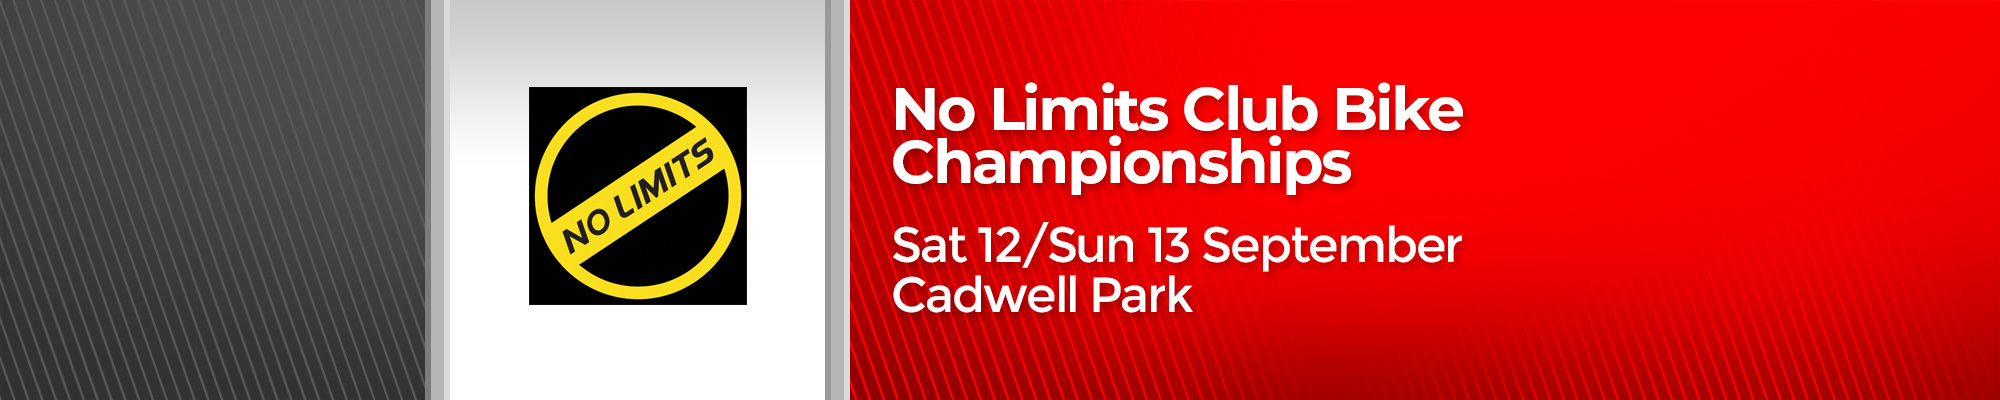 No Limits Racing Club Bike Championships